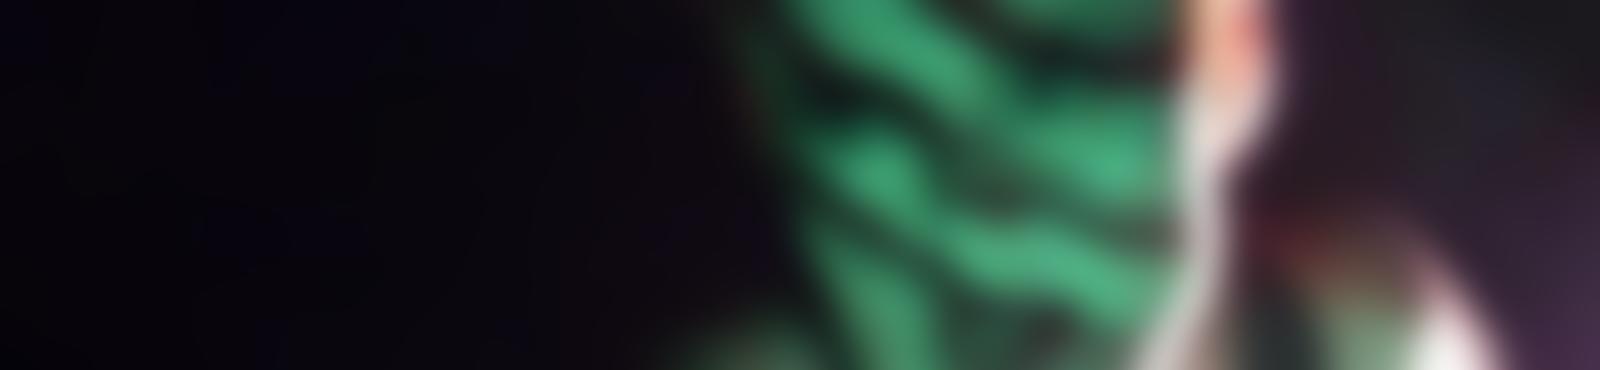 Blurred bc2be0ab 95c2 432c a632 7580abbadd07